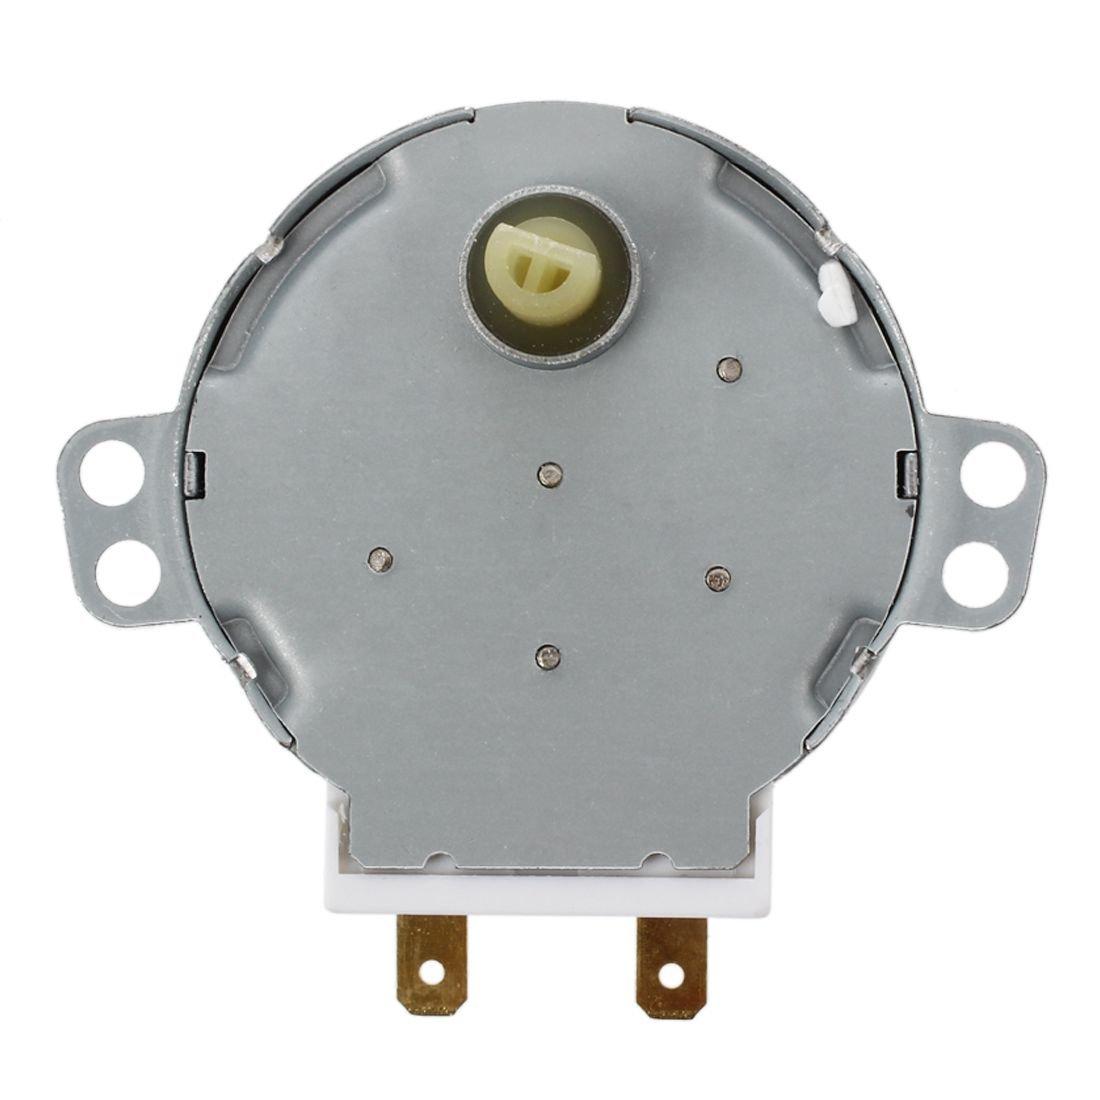 6RPM AC 240V WOVELOT Motor sincronico de la plataforma giratoria del horno de microonda CW//CCW 4W 5